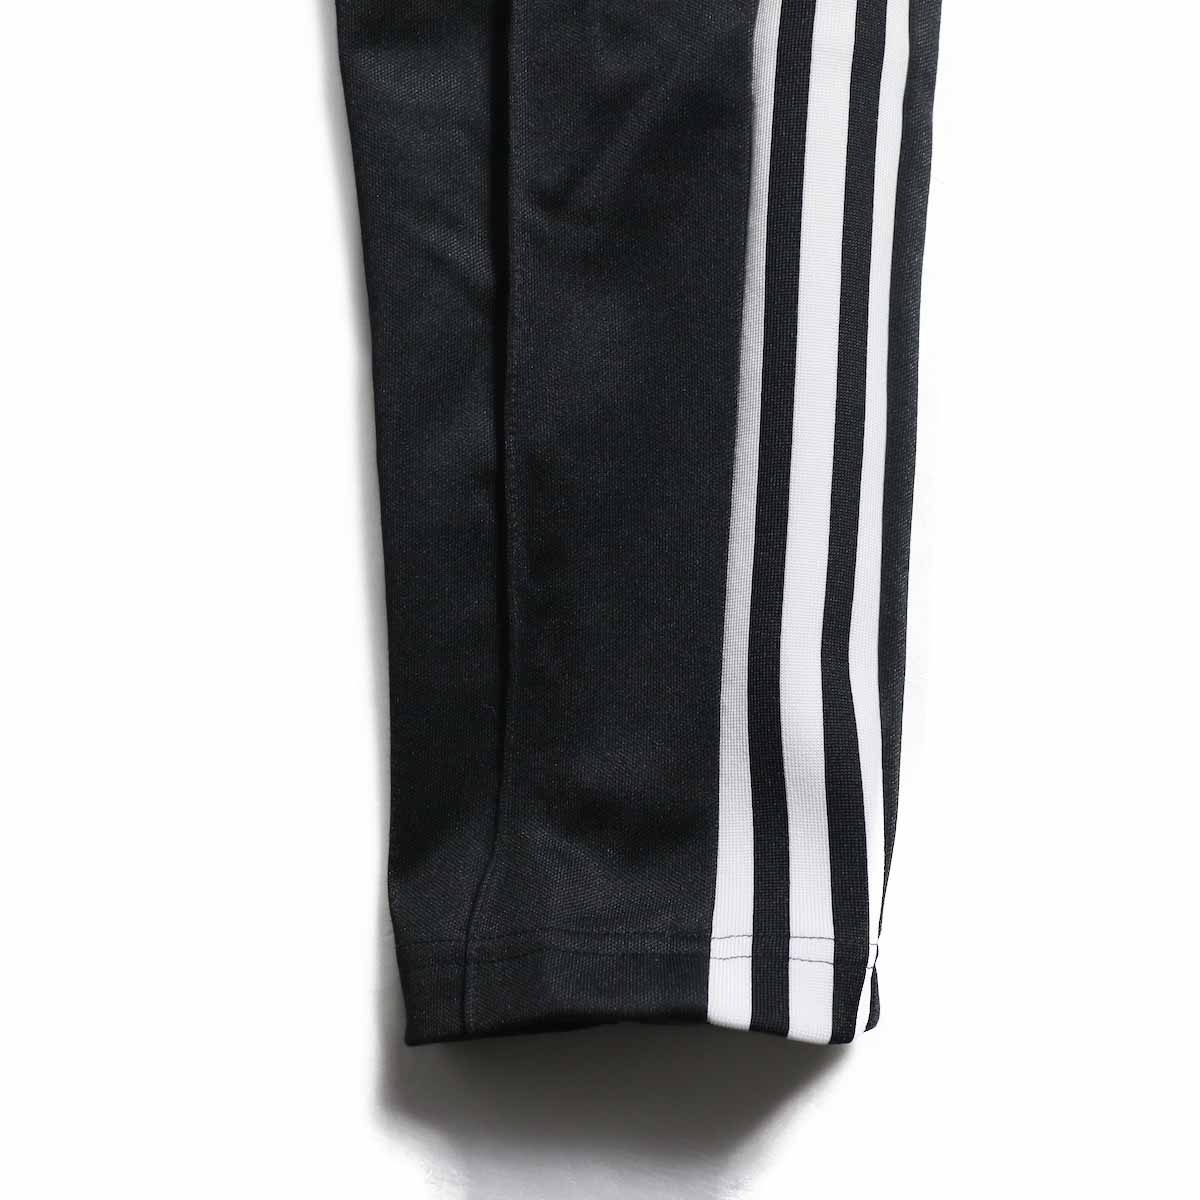 adidas originals / Beckenbauer Track Pants -Black 裾